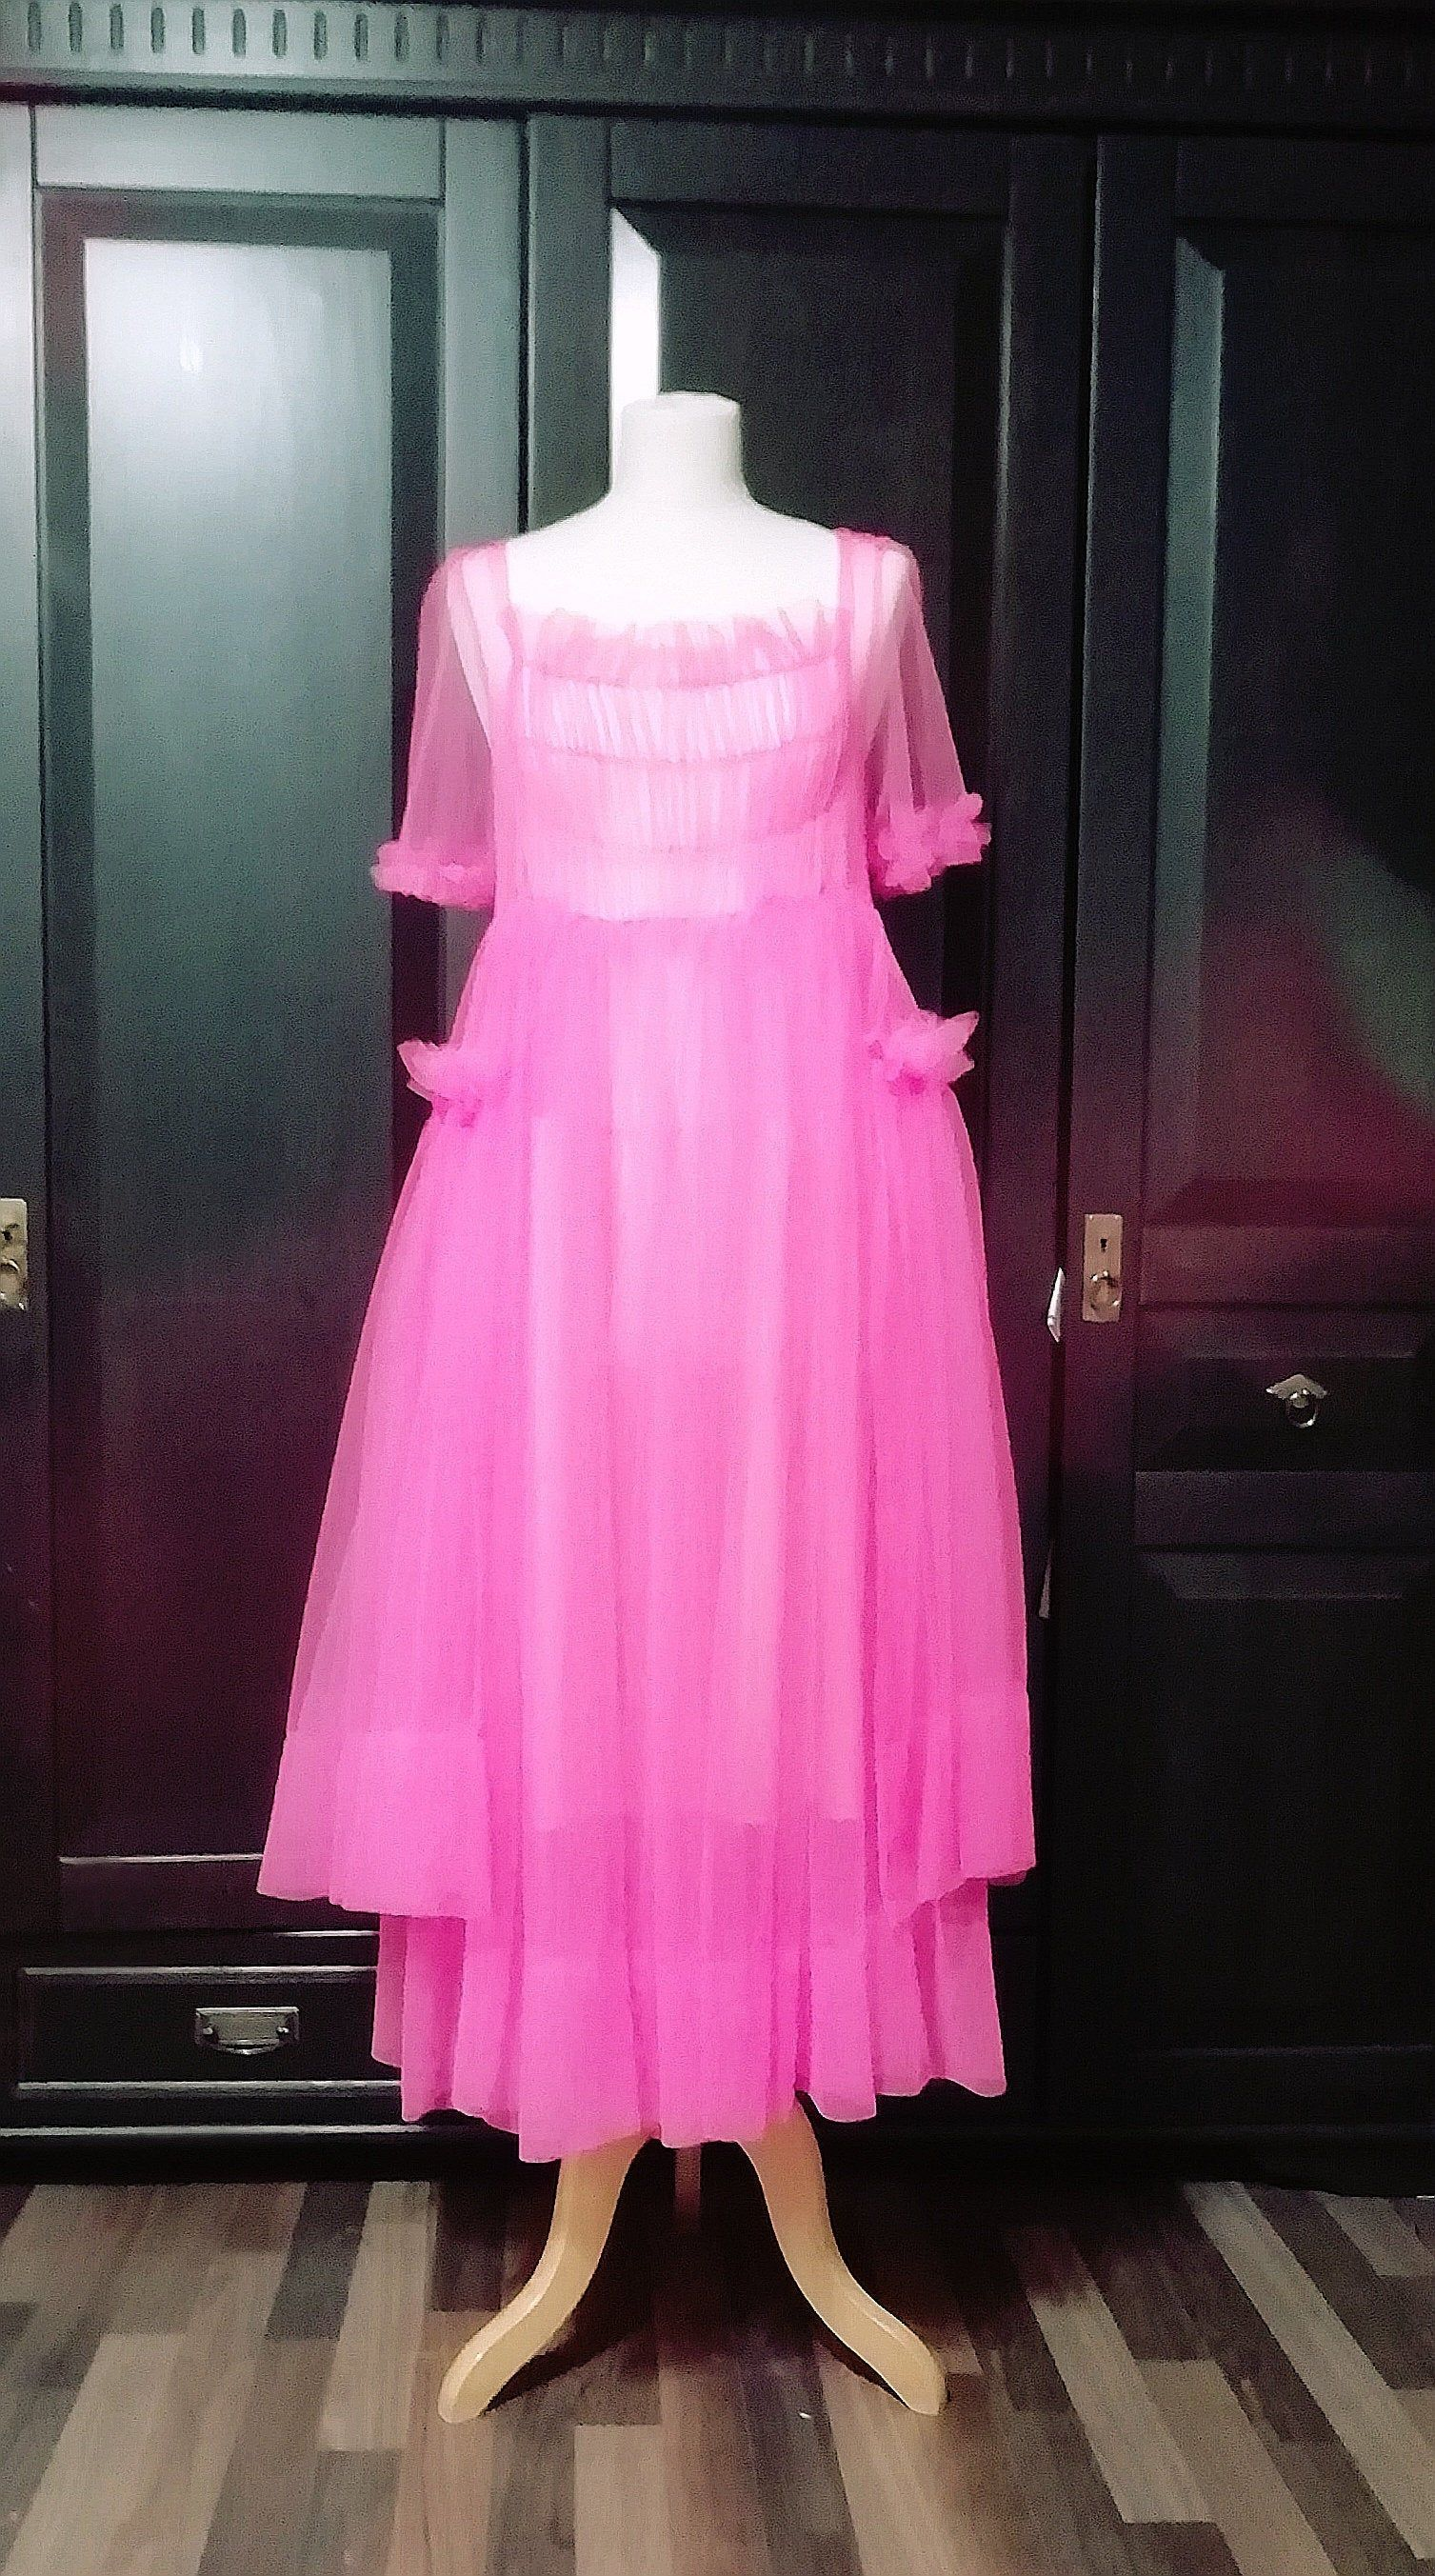 Oversize Pink Tullkleid Etsy Tullkleid Modestil Pinkes Kleid [ 2705 x 1507 Pixel ]